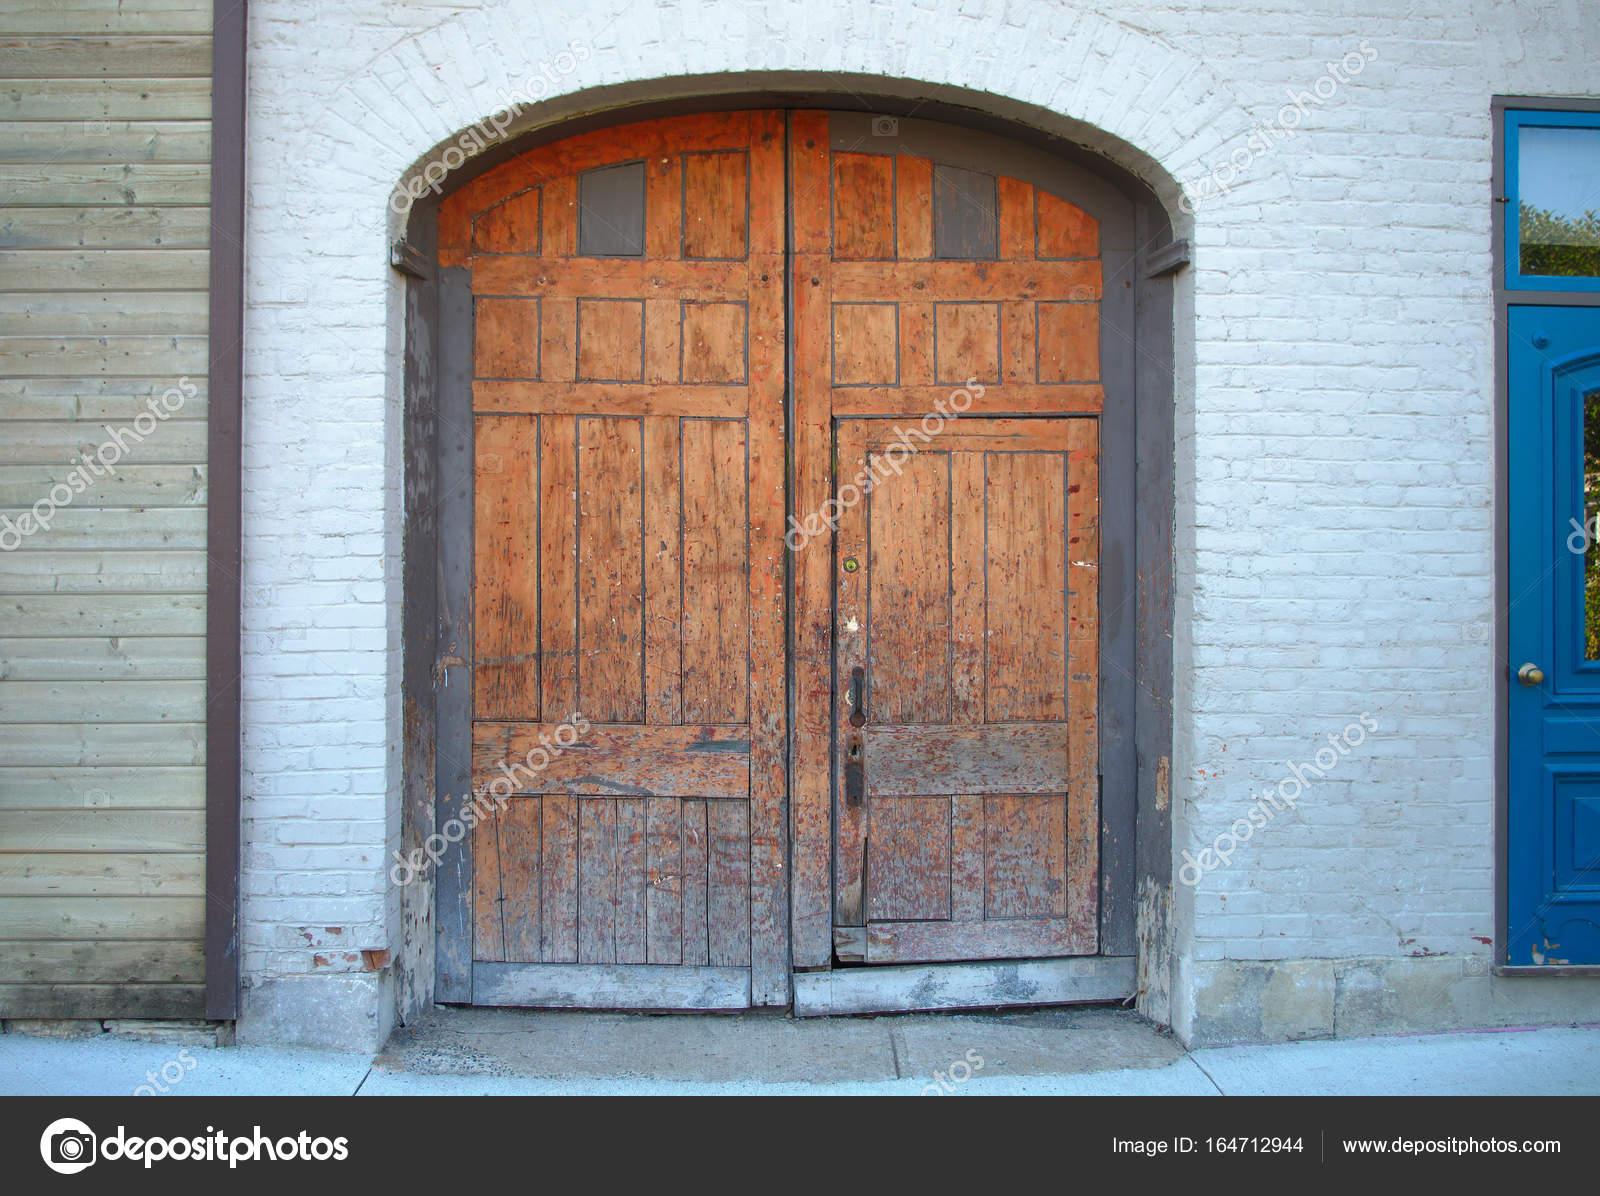 arquitectura de entrada de antigua puerta exterior arco de puerta de ...